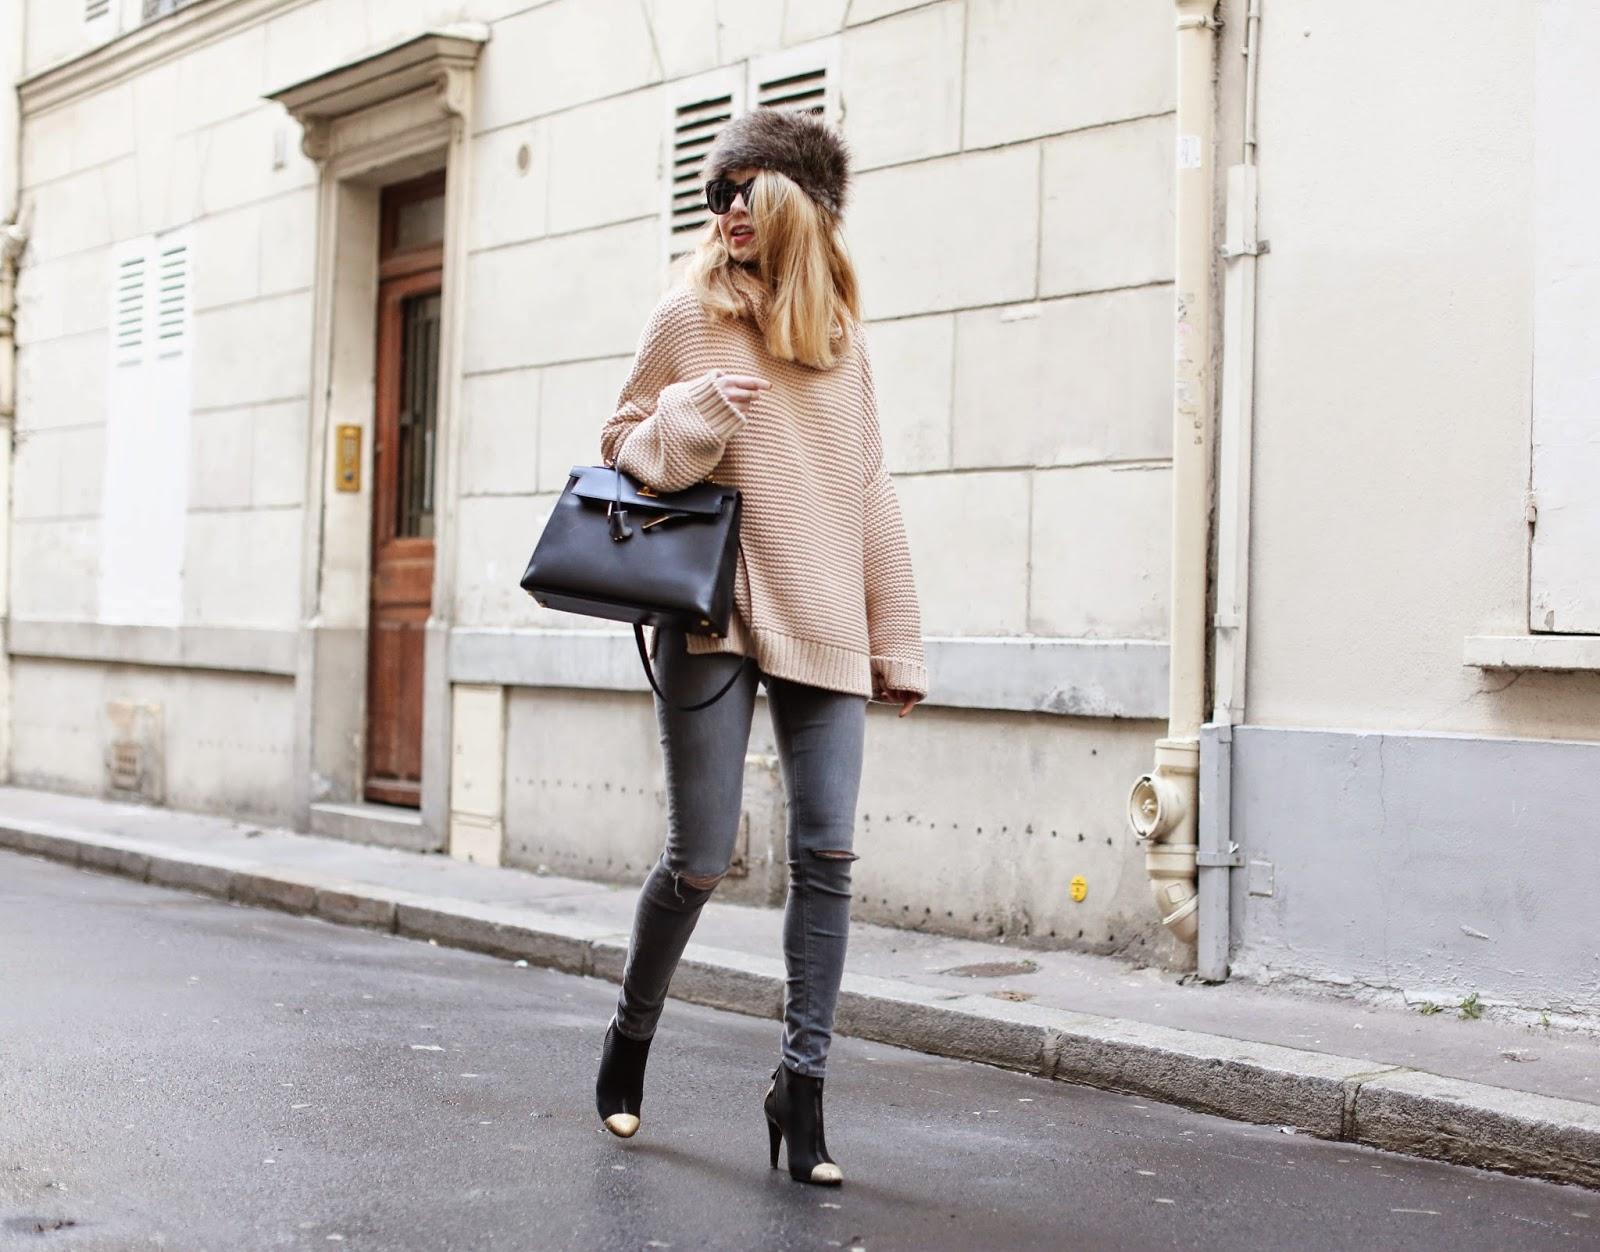 cosy knit, zara, chanel, hermès, topshop, fur hat, streetstyle, paris